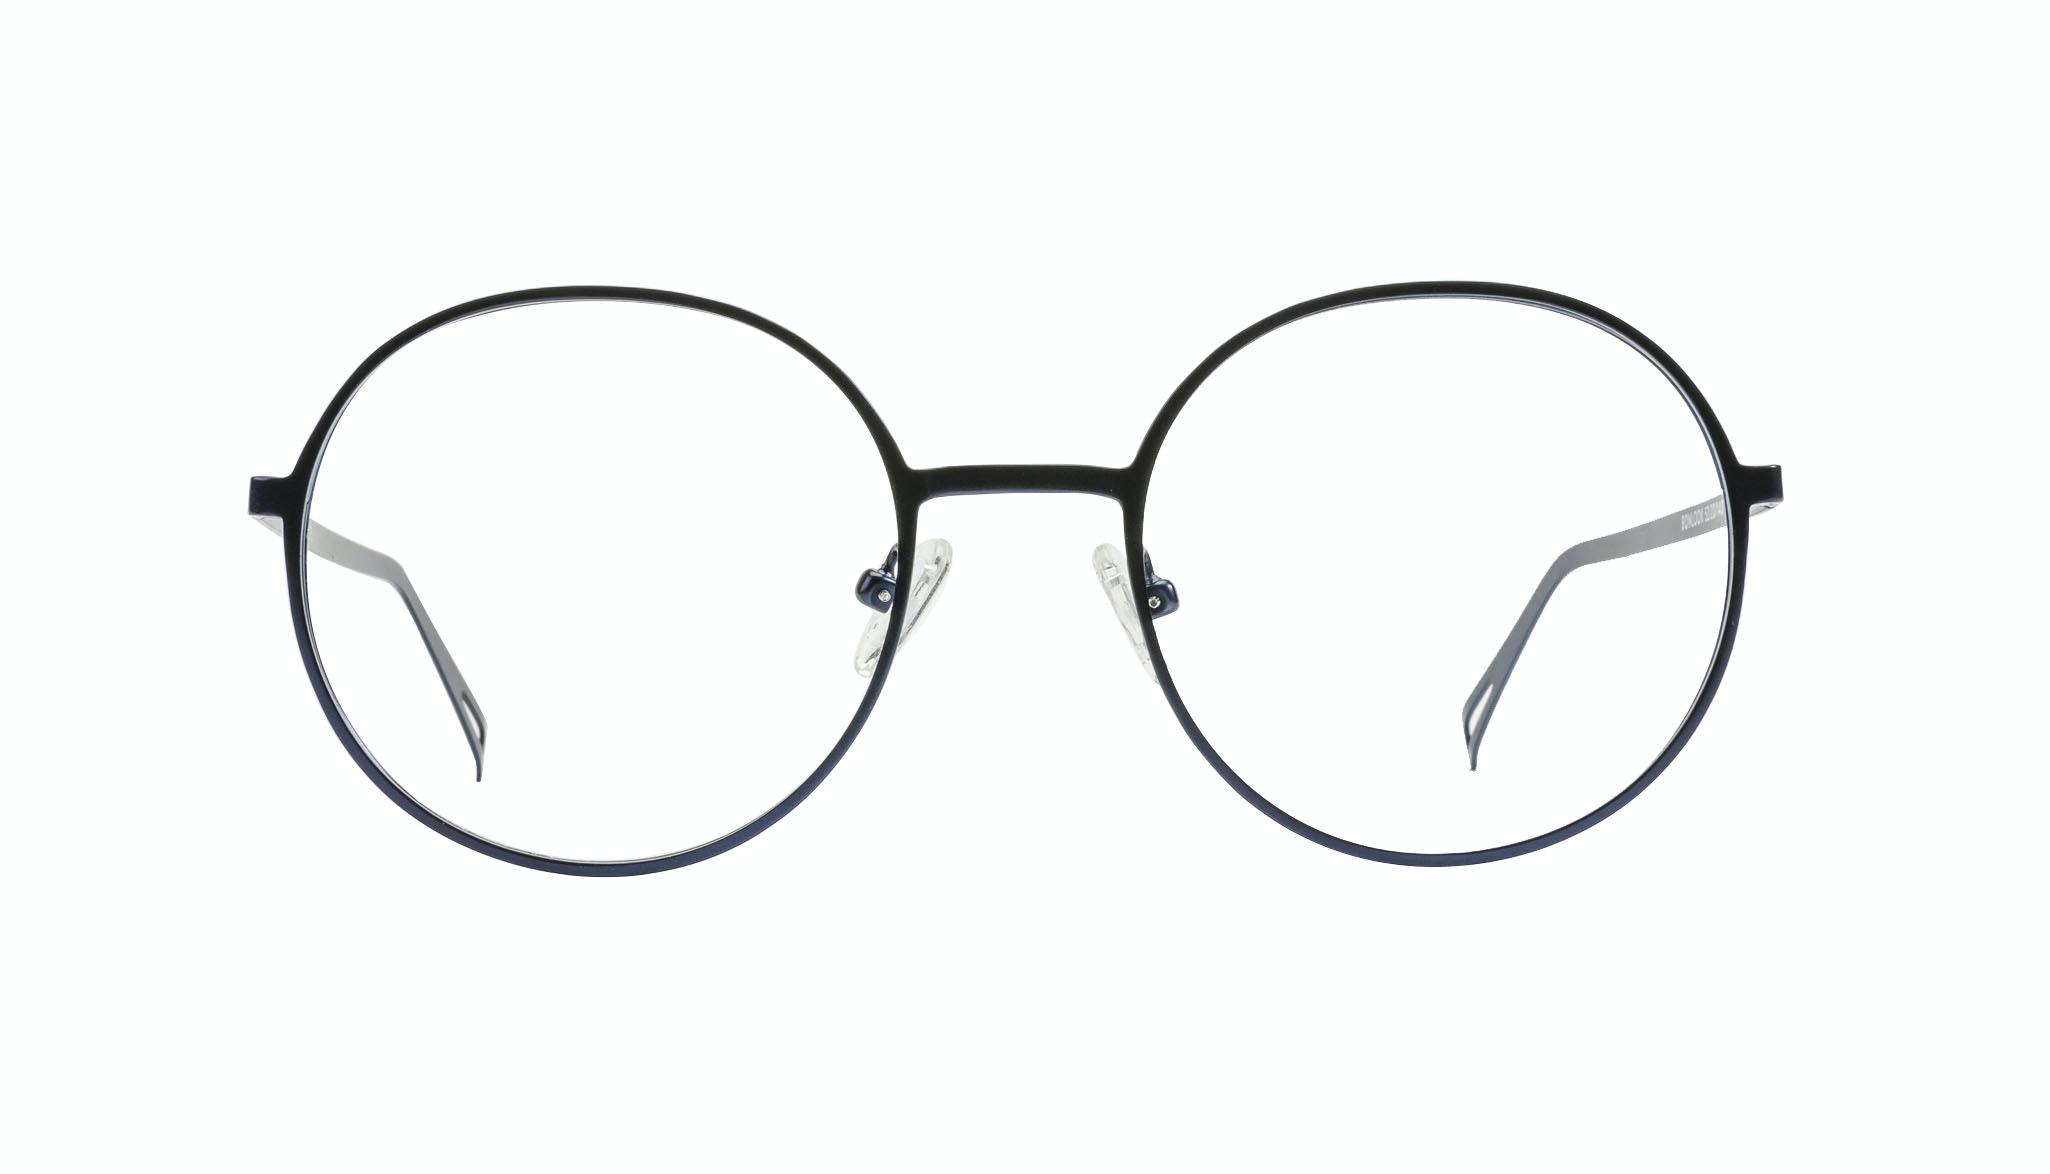 Affordable Fashion Glasses Round Eyeglasses Men Women Varna Navy Front